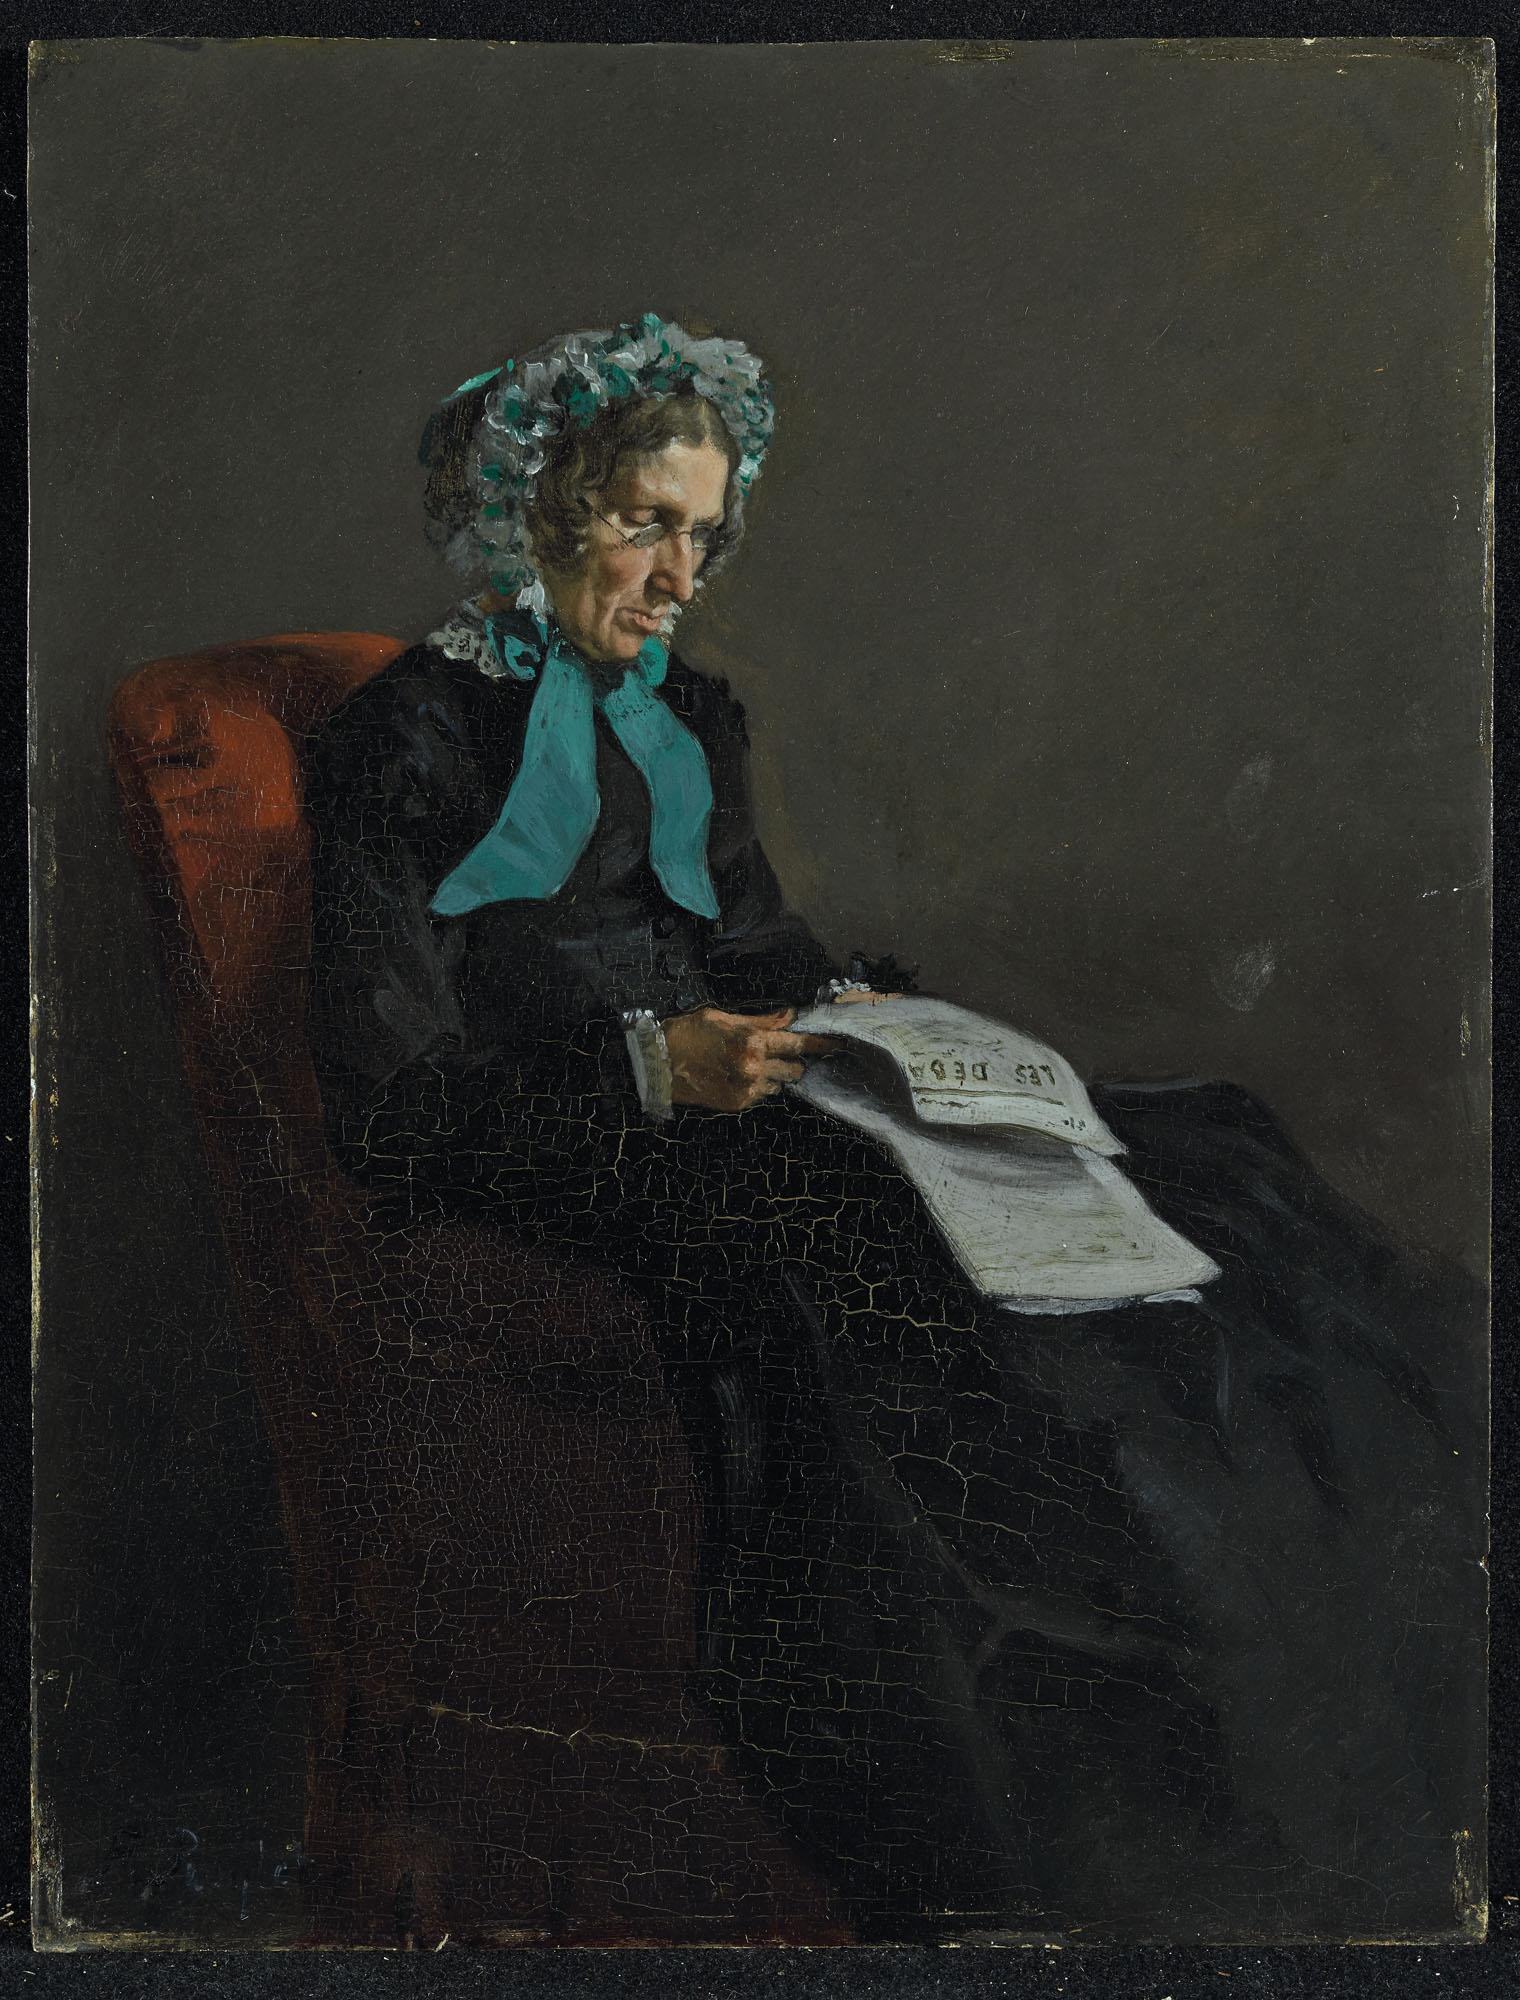 FERDINAND VICTOR LÉON ROYBET (UZÈS 1840-1920 PARIS)